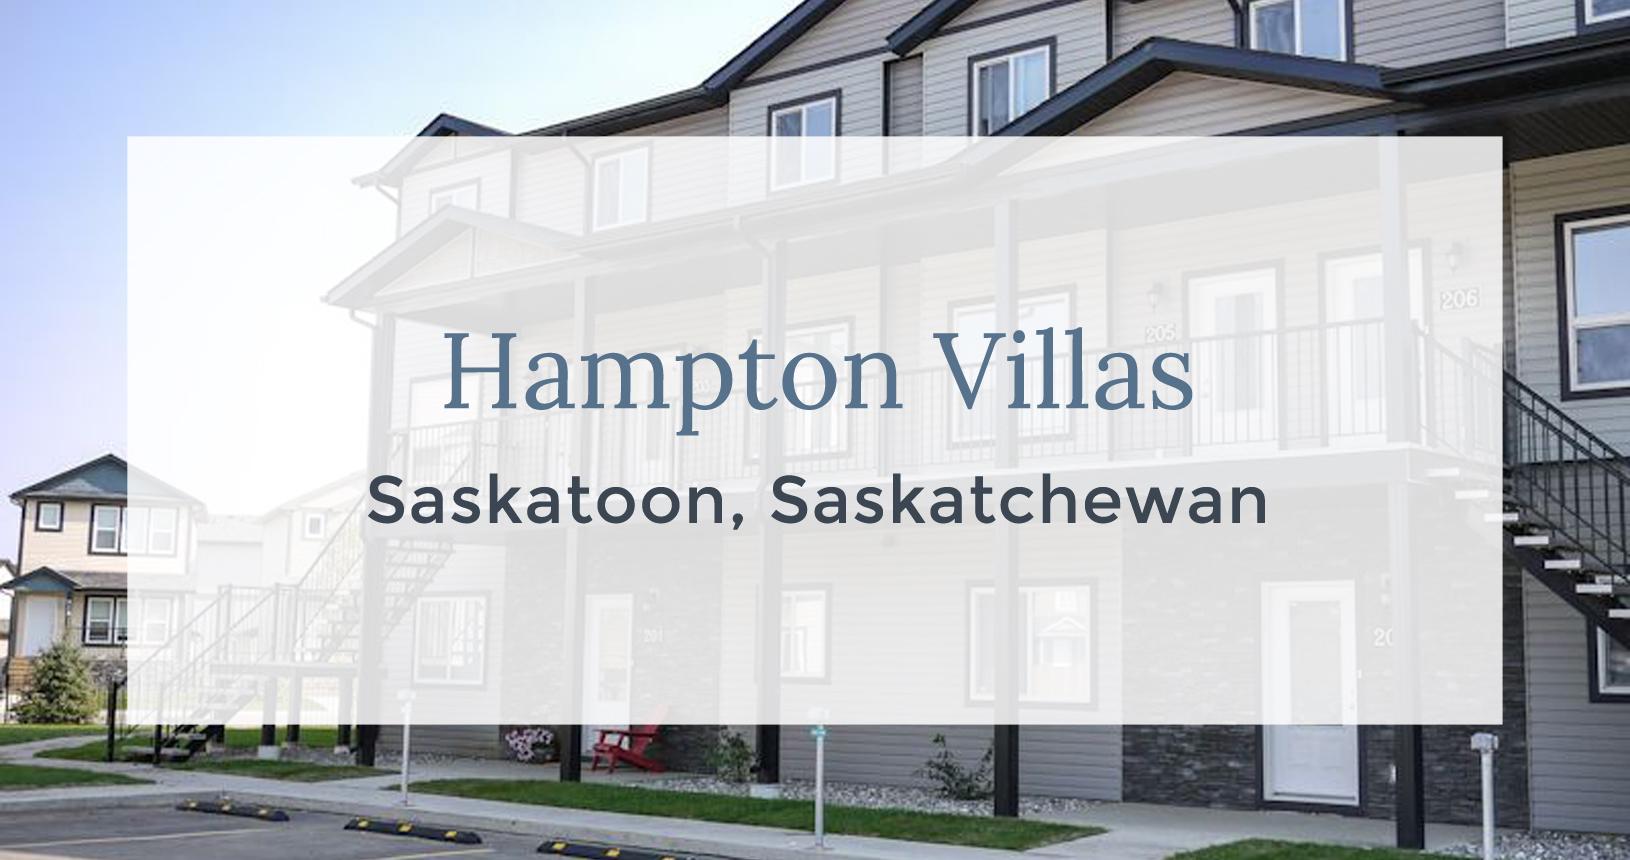 Hampton Villas: Saskatoon, Saskatchewan